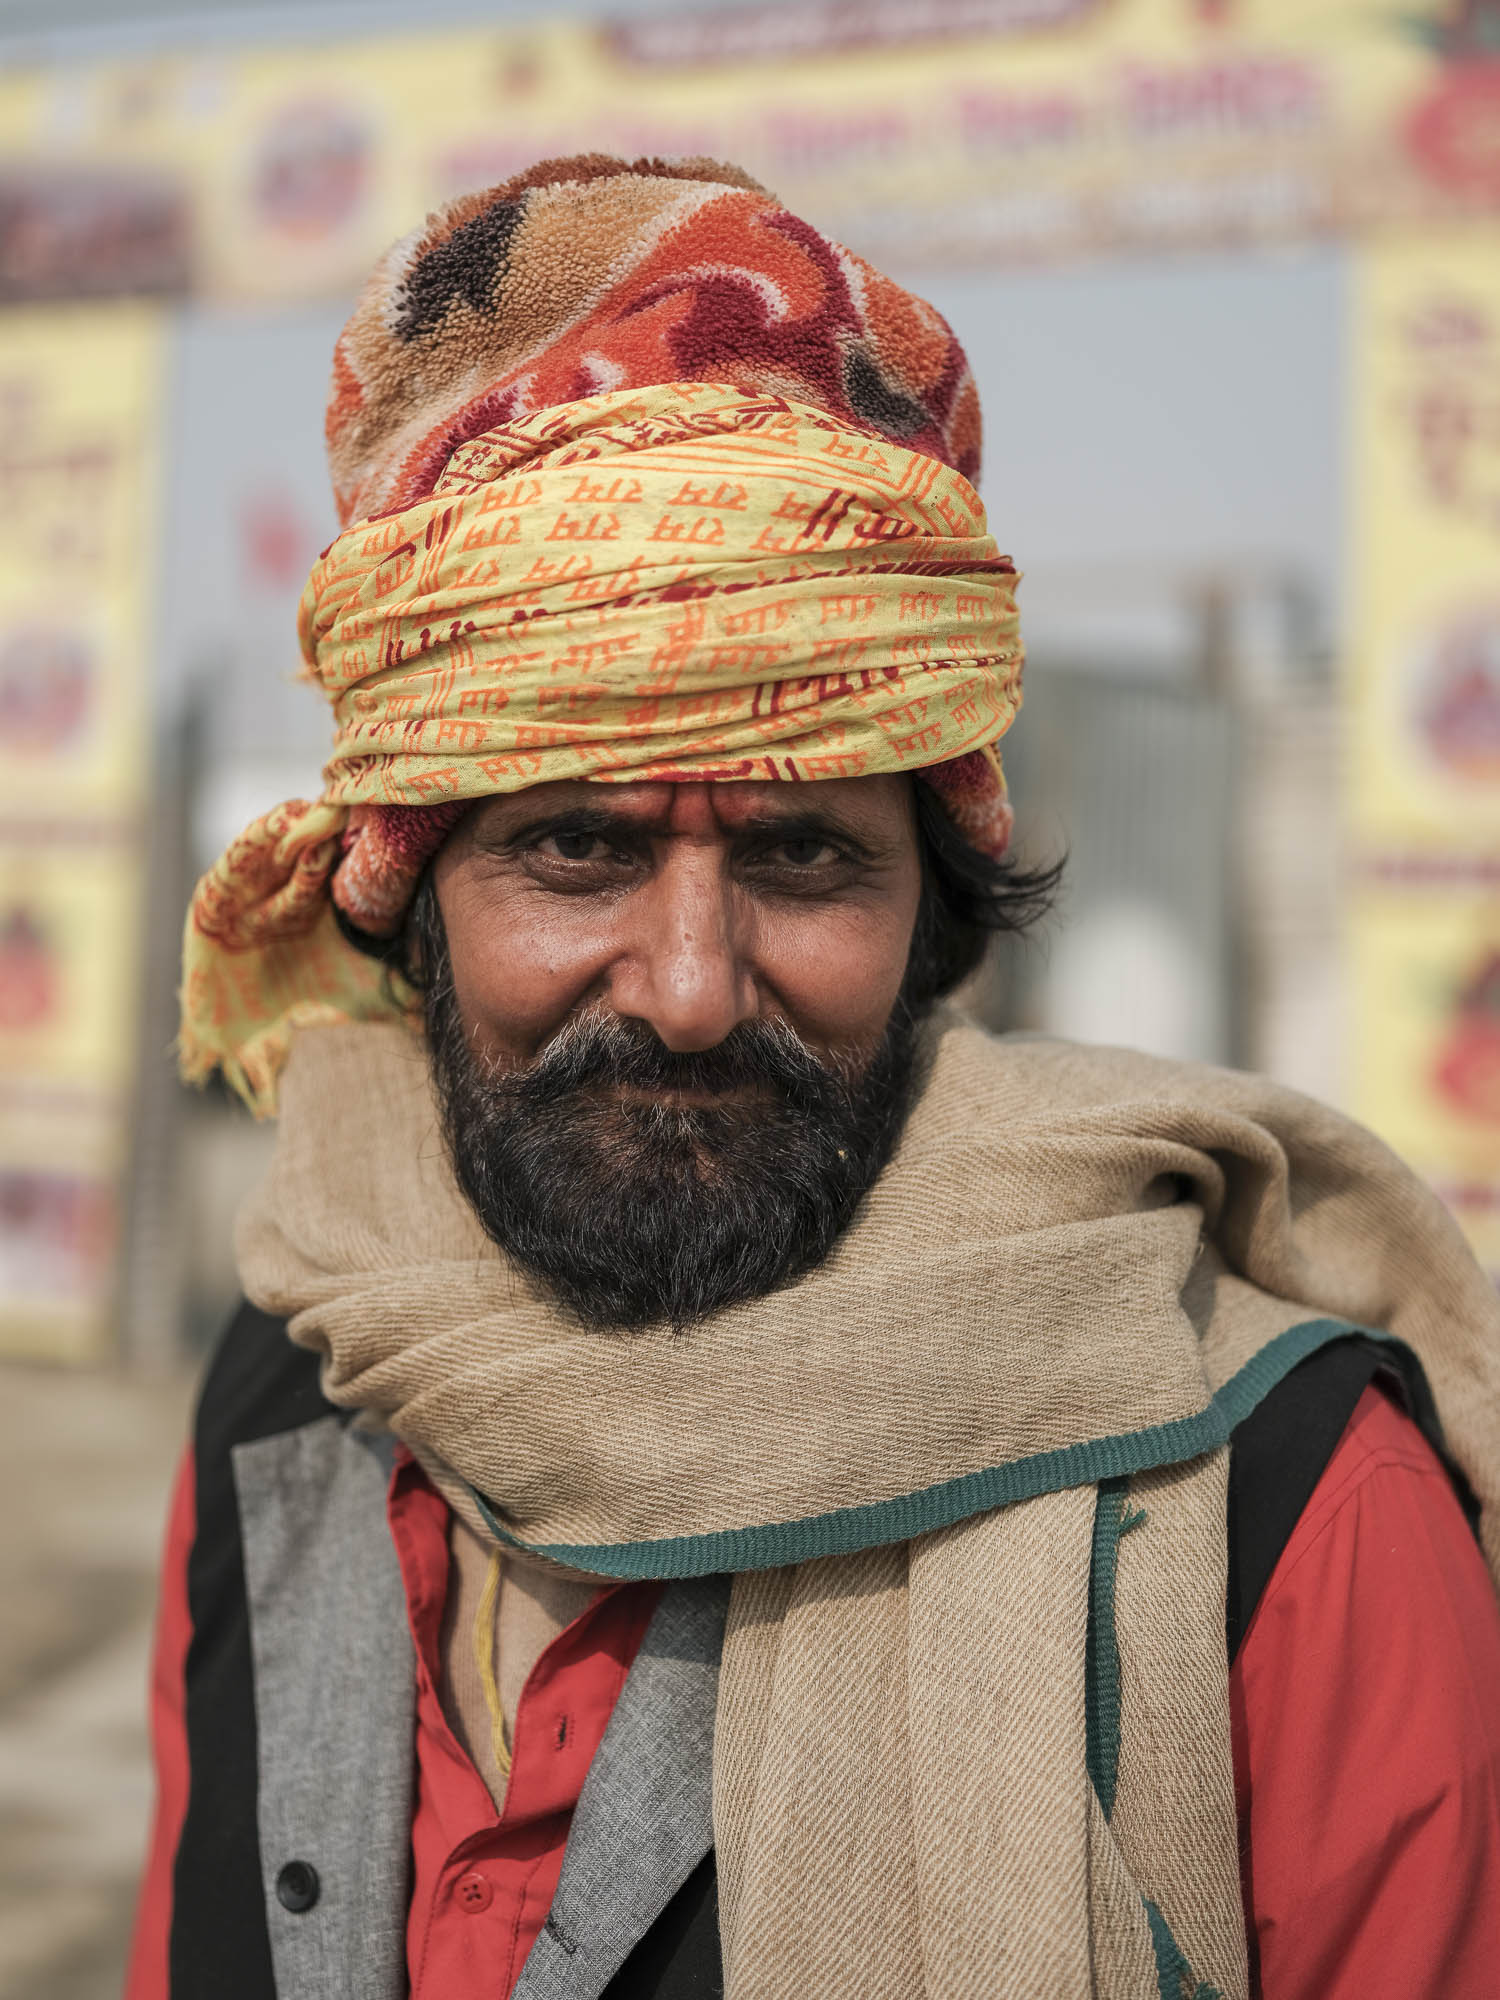 portait man pilgrims Kumbh mela 2019 India Allahabad Prayagraj Ardh hindu religious Festival event rivers photographer jose jeuland photography